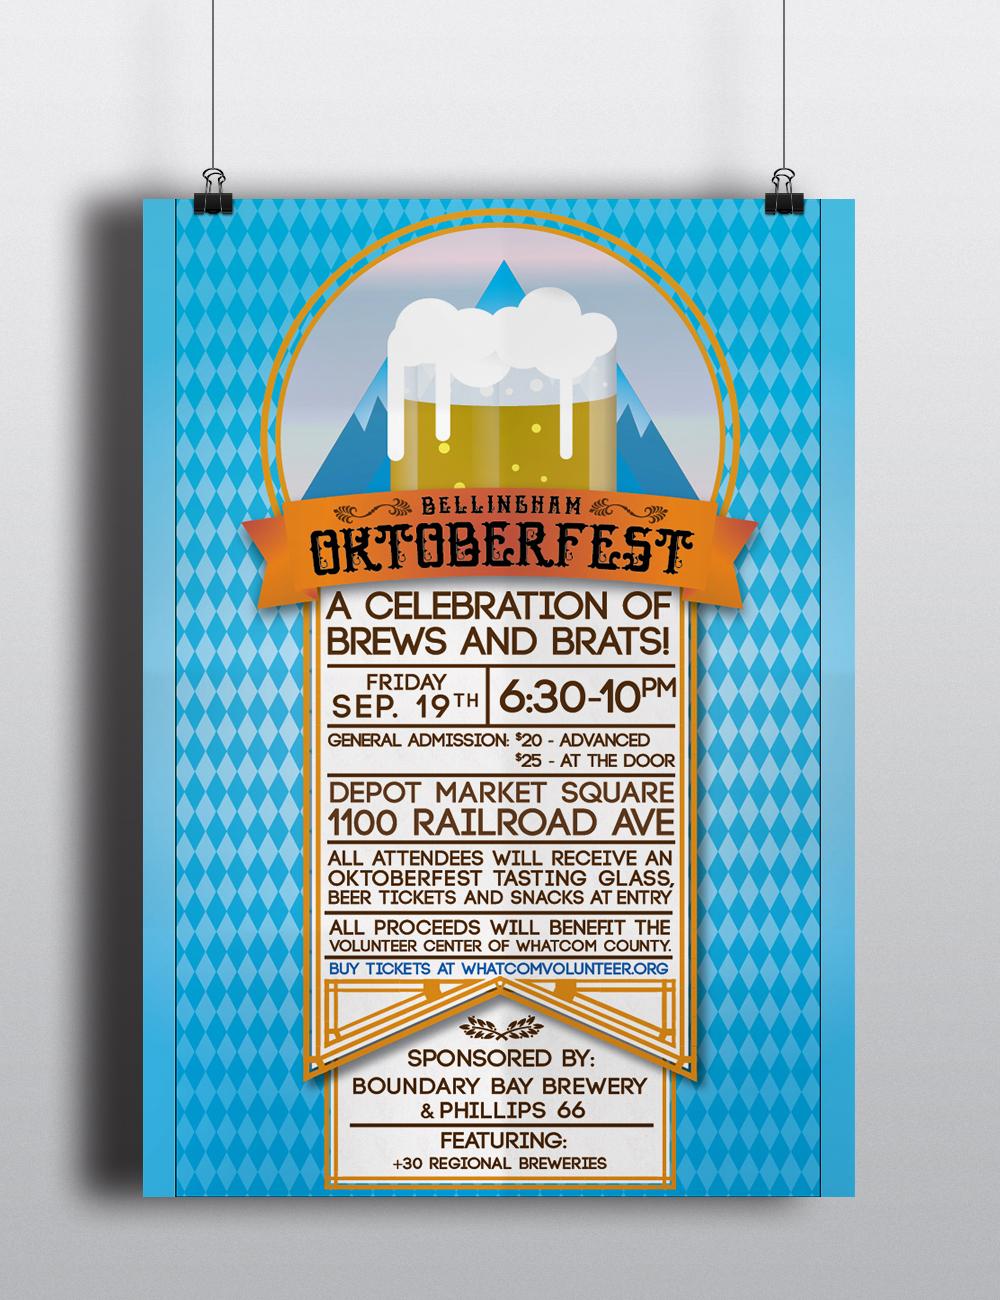 Beerfest_Poster_Mockup